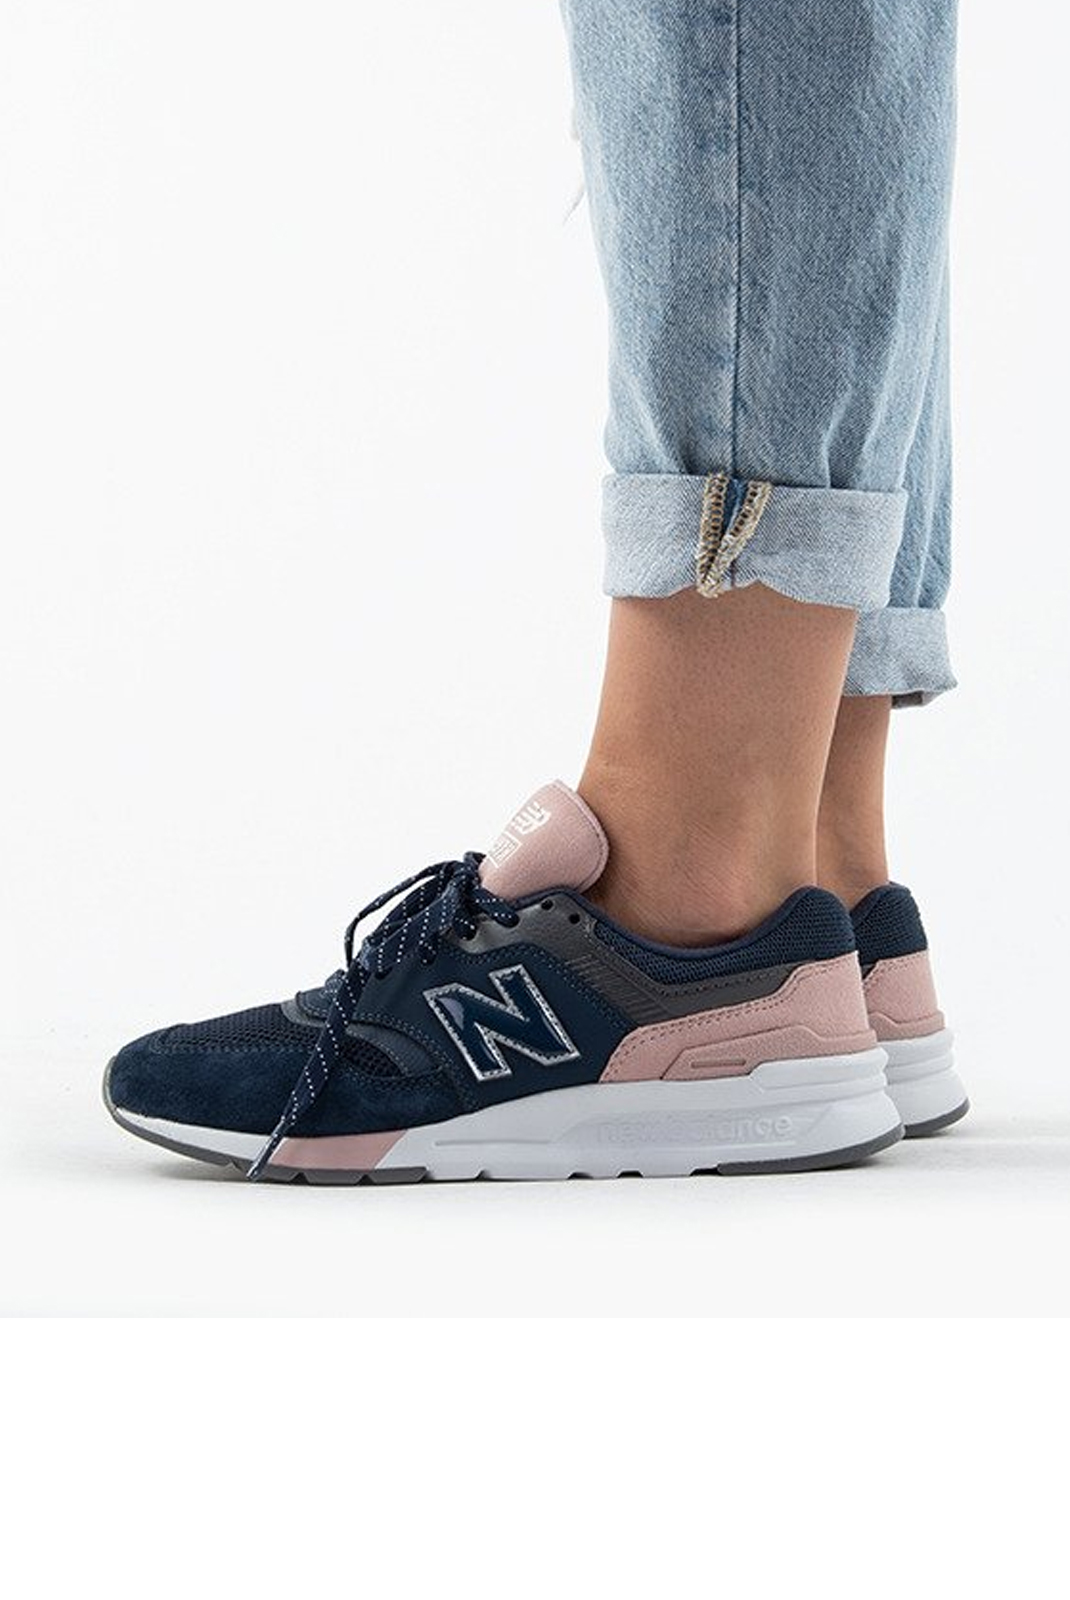 Baskets / Sneakers  New balance CW997HYA YA bleu rose